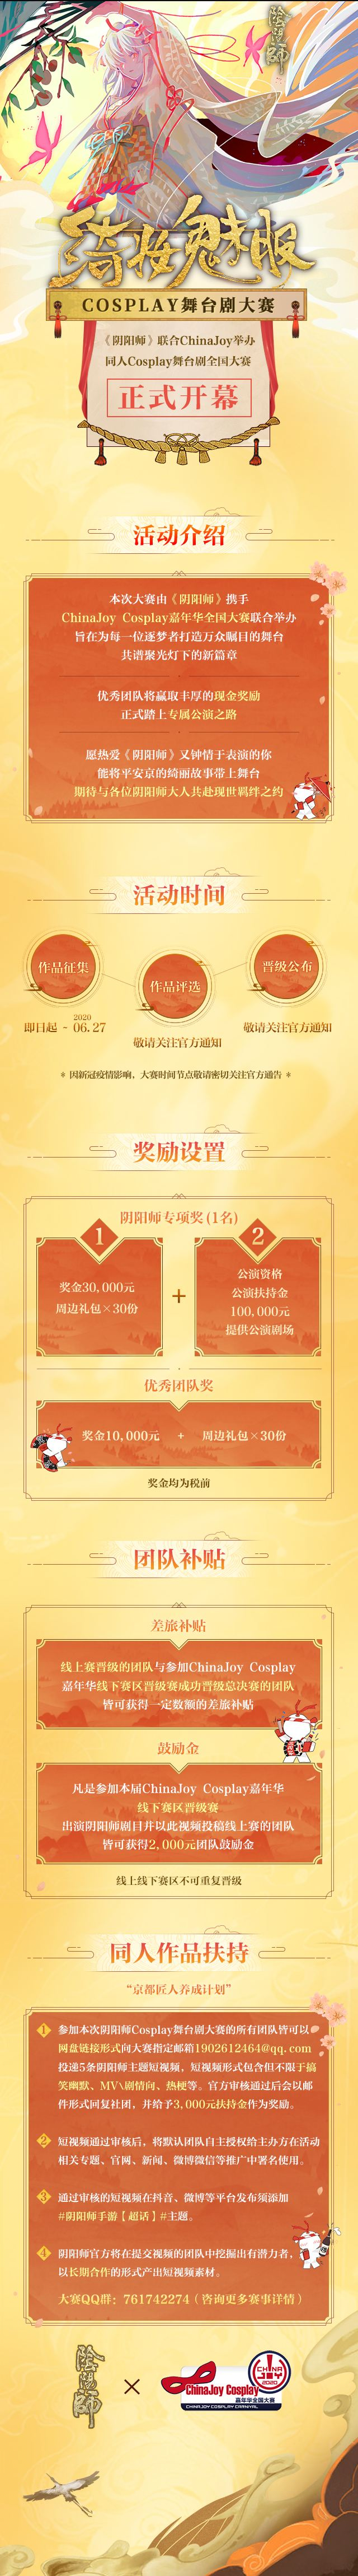 CJCosplay嘉年华携手《阴阳师》绮妆魅影Cosplay舞台剧全国大赛正式开幕!